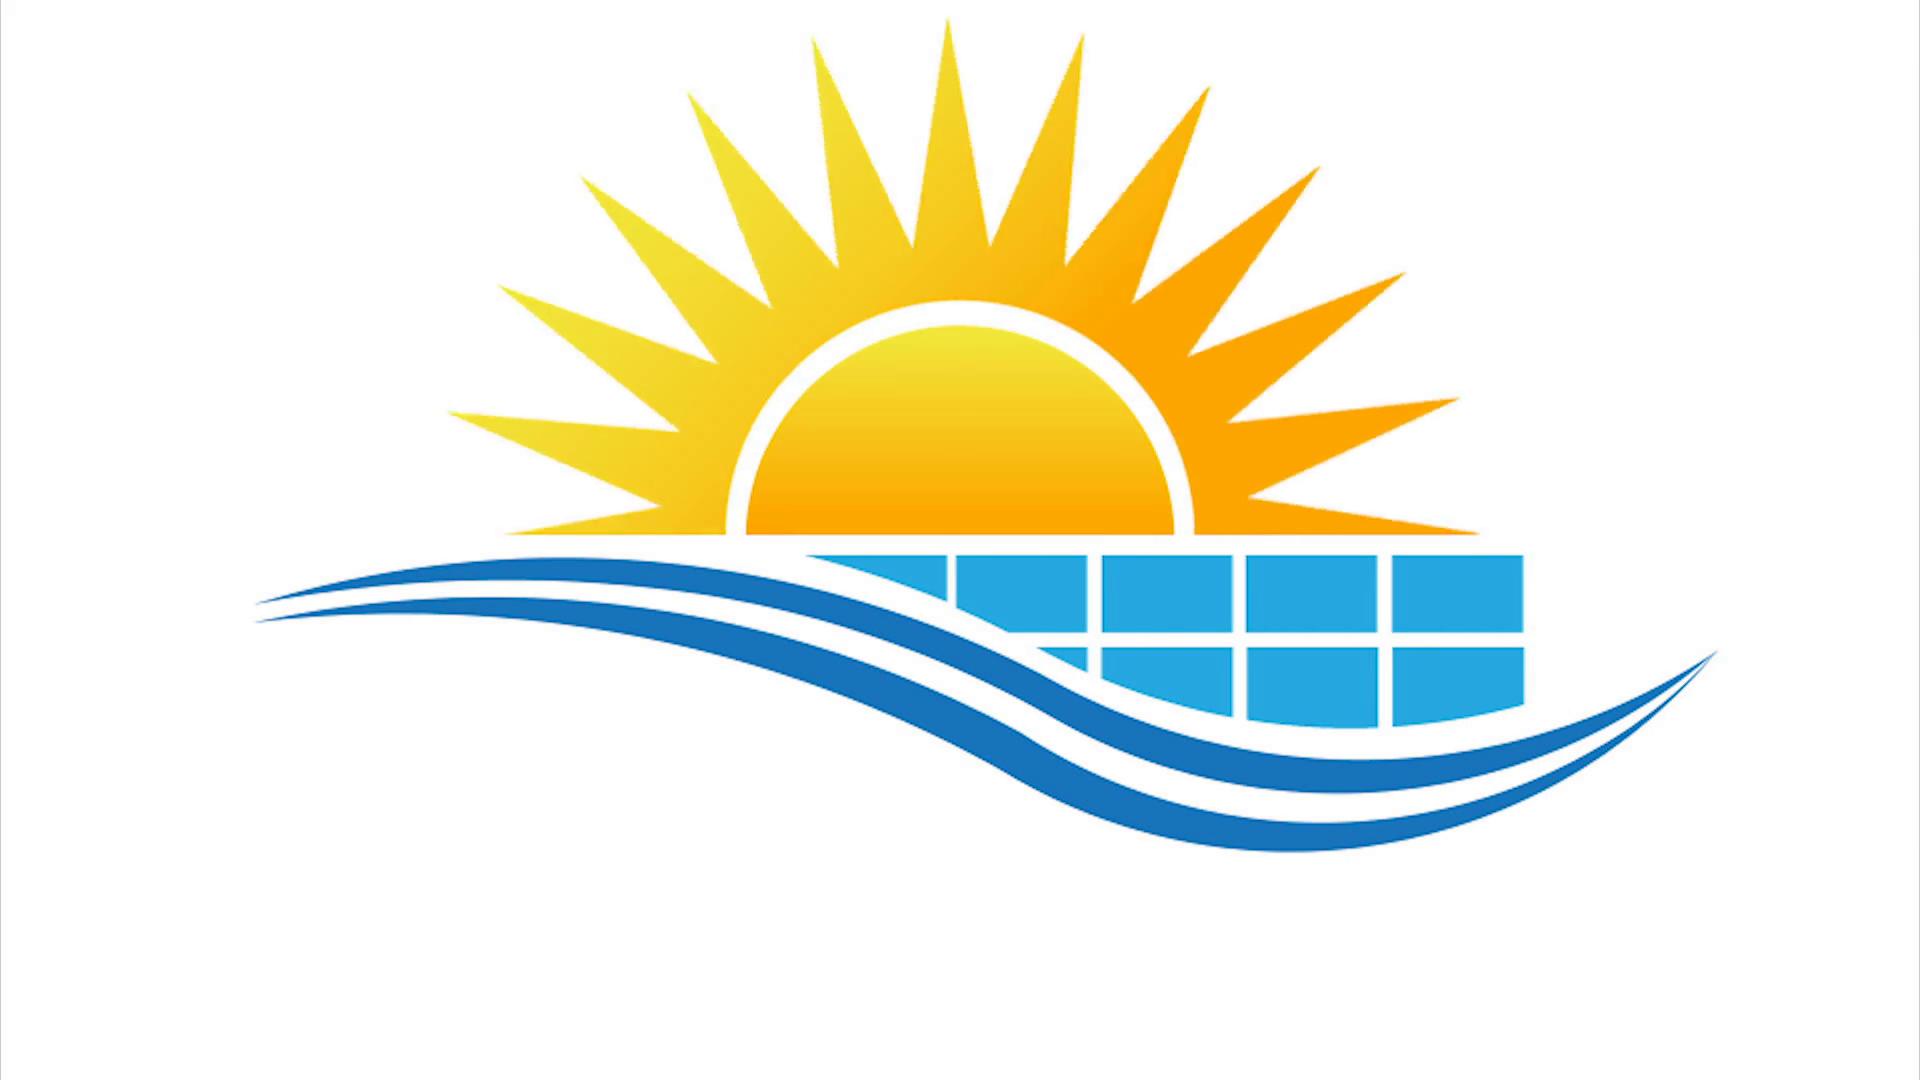 Sun With Solar Panel Logo Video Animation Hd Motion Background Videoblocks Solar Logo Sun Logo Animation Background